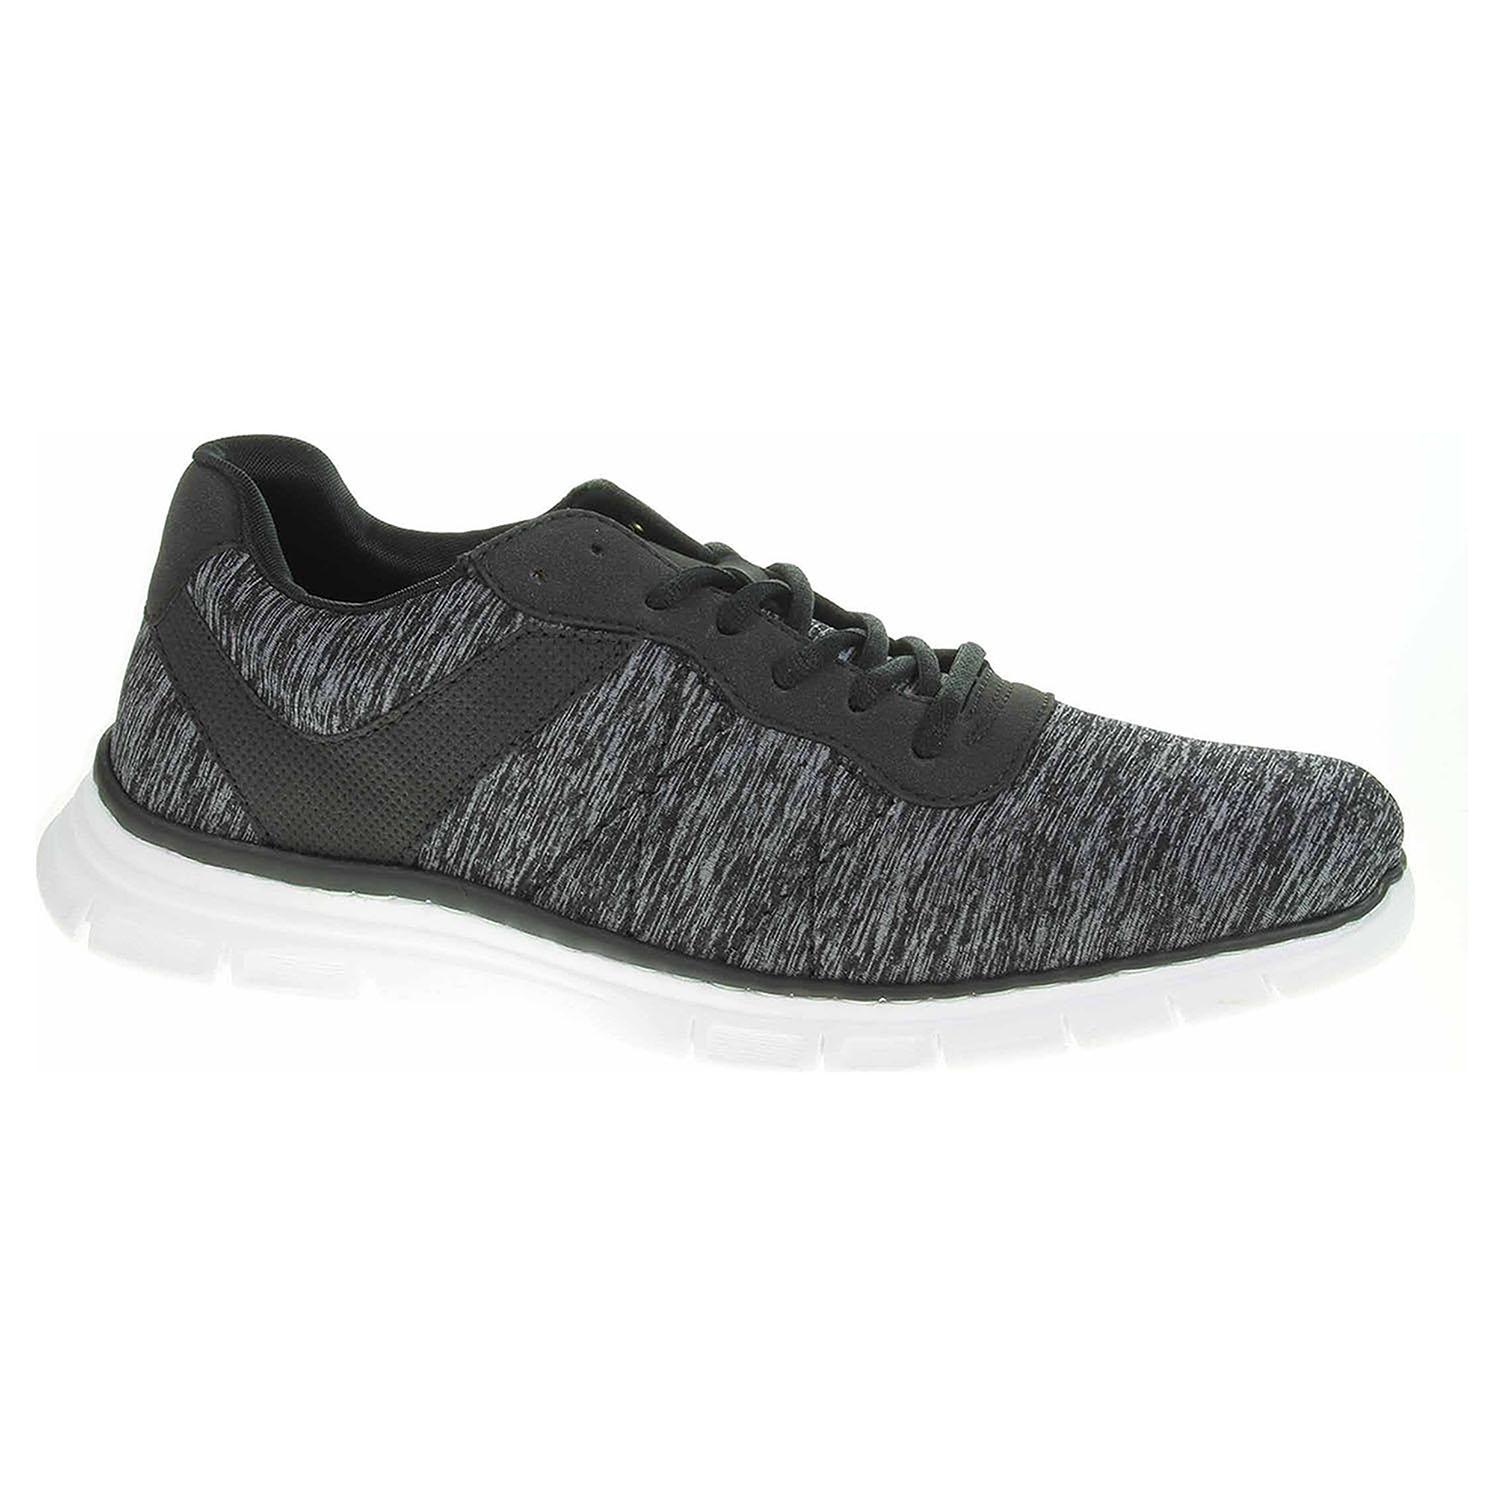 Pánská obuv Rieker B4808-46 schwarz kombi B4808-46 41